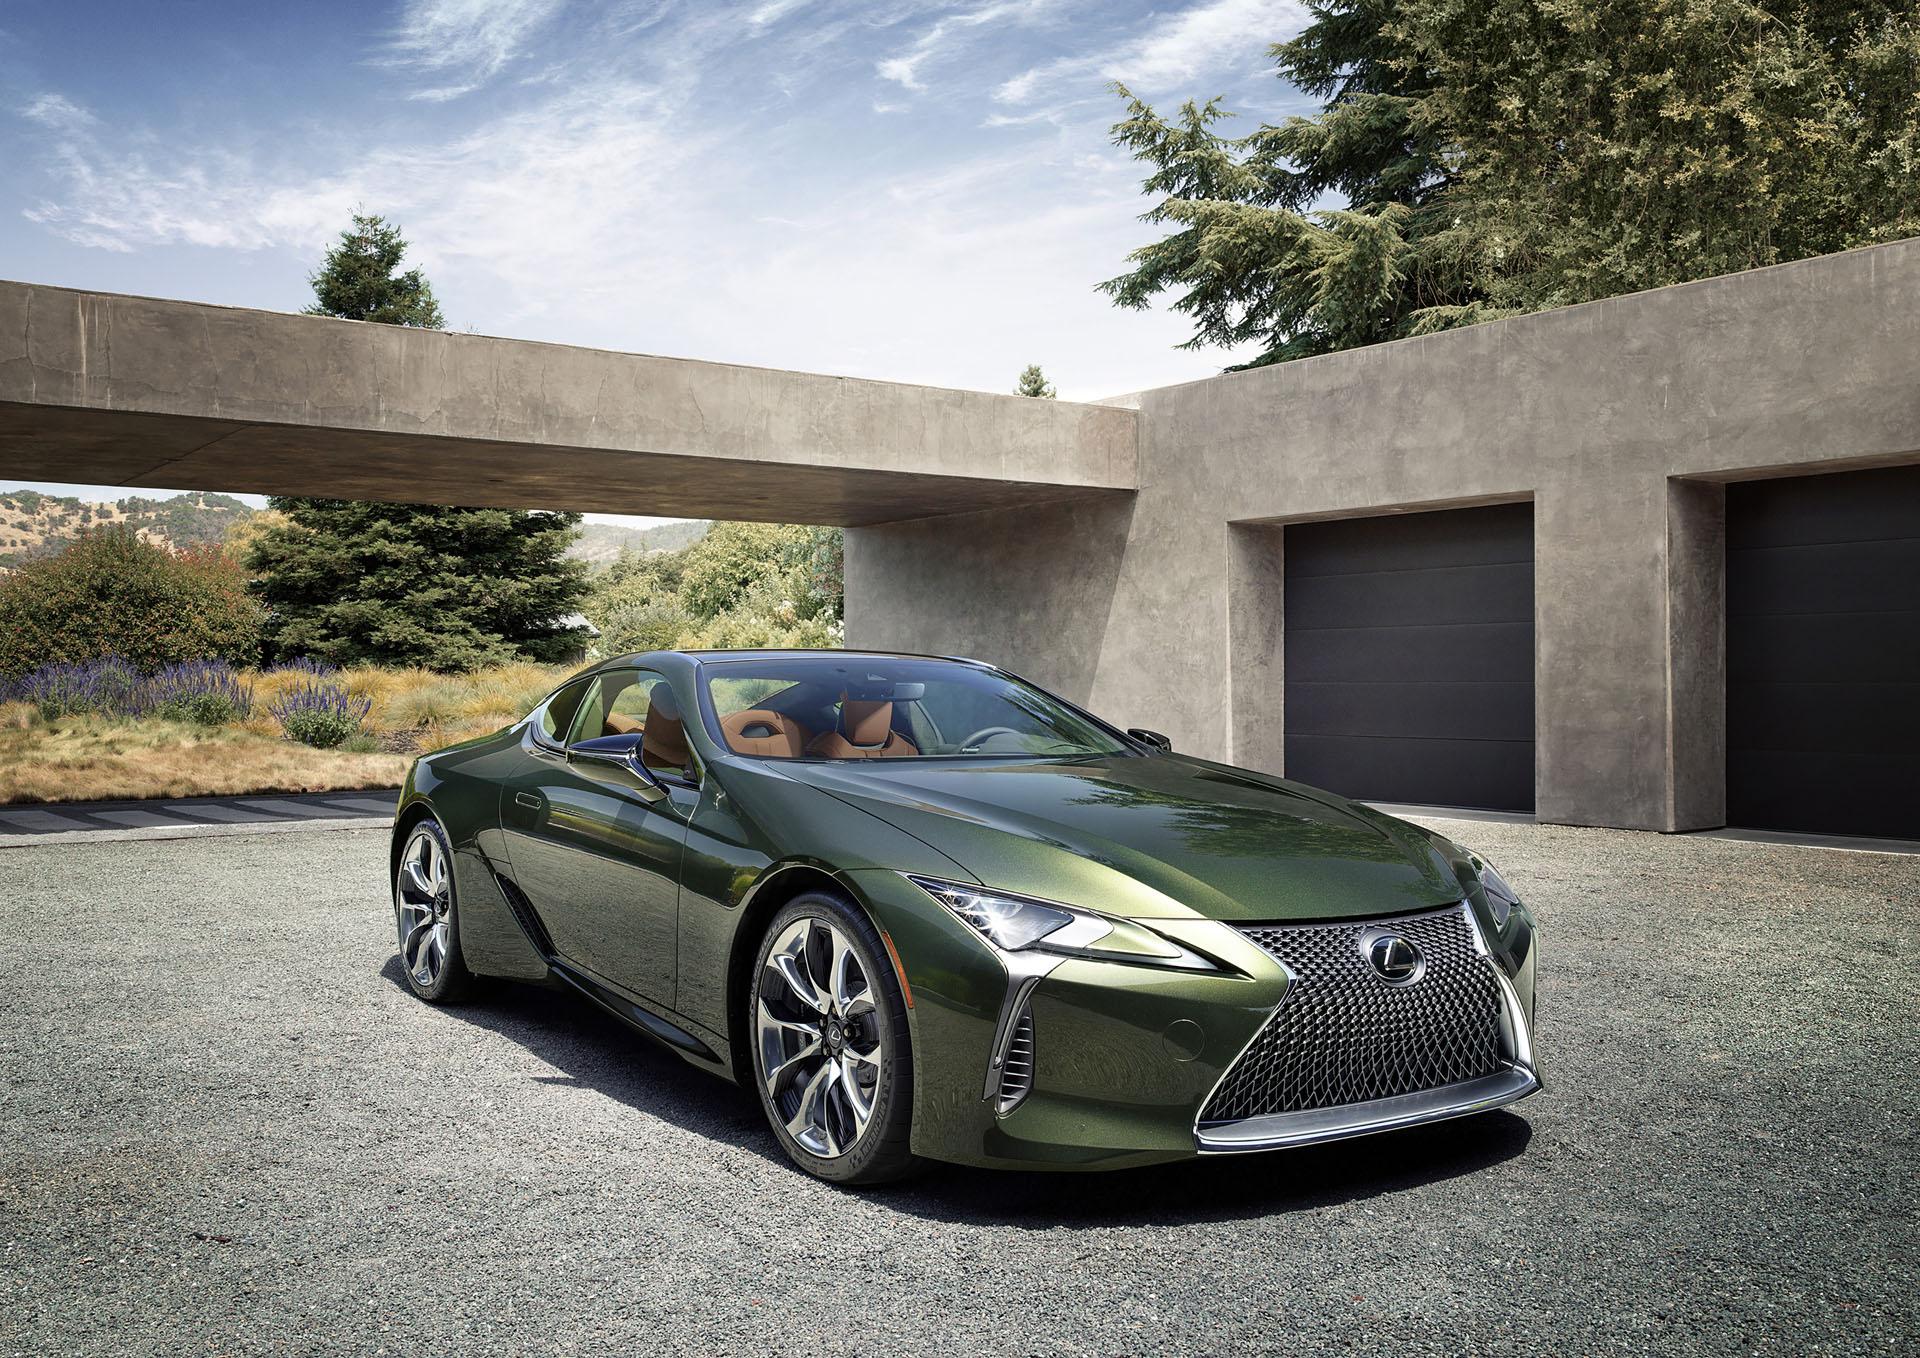 2020 Lexus Lf Lc Spy Shoot